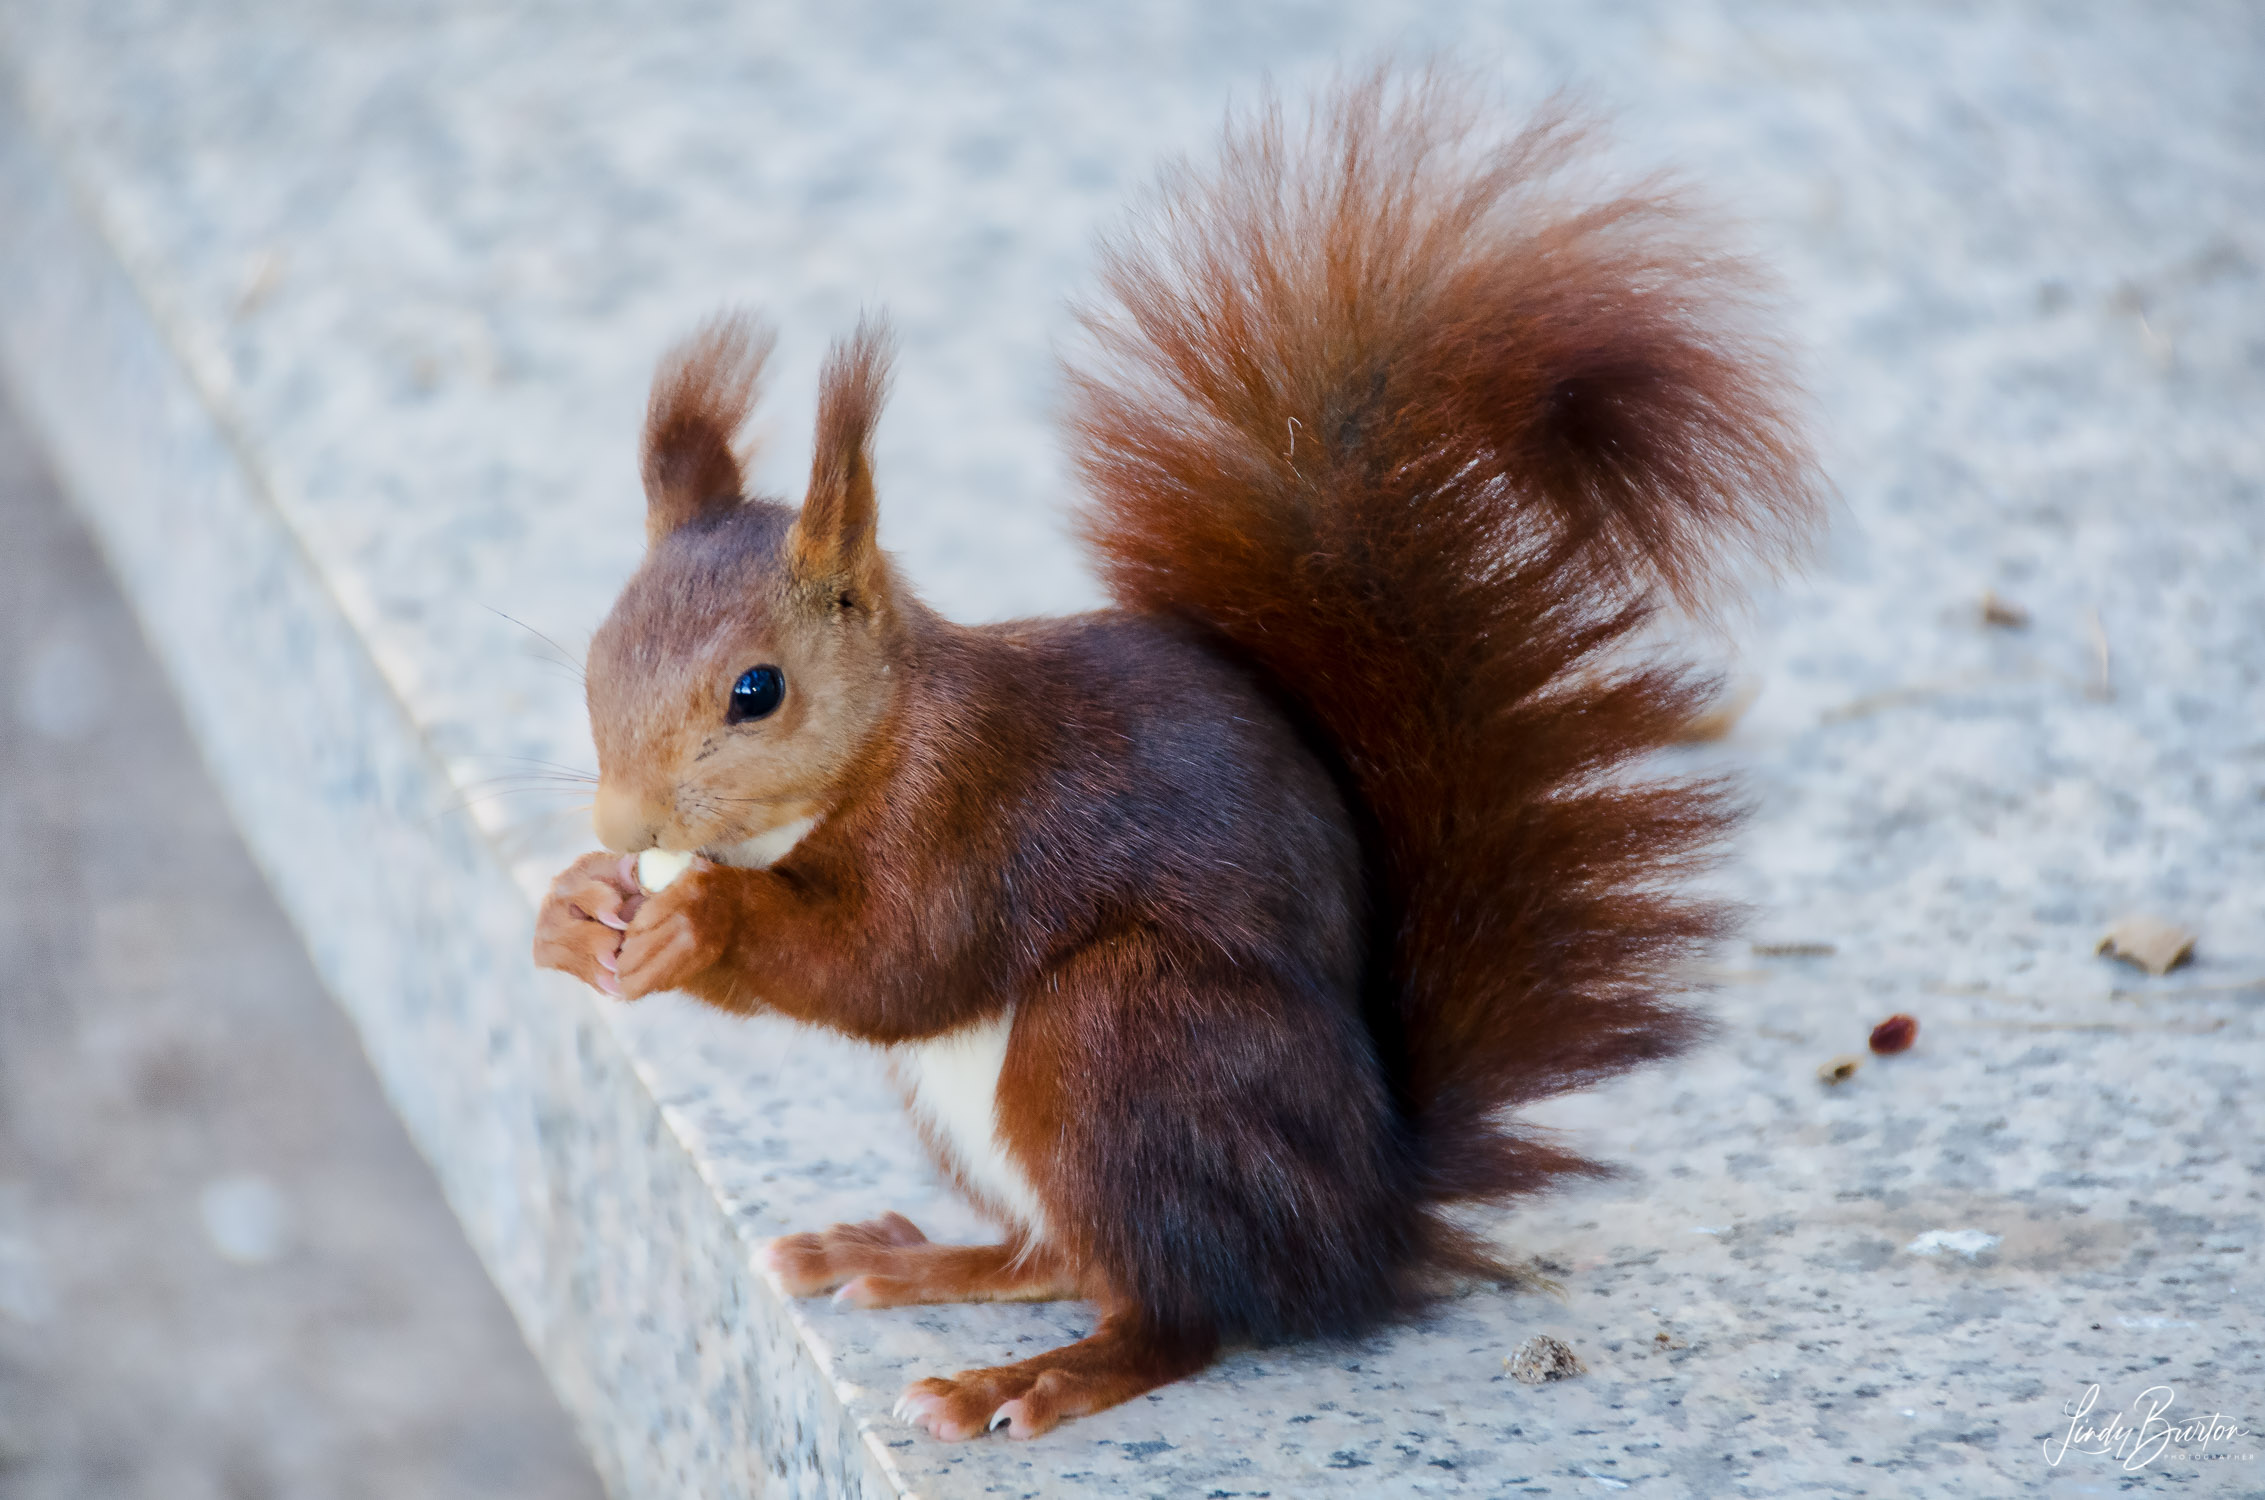 Camino Frances Squirrel on the way to Navarete Spain